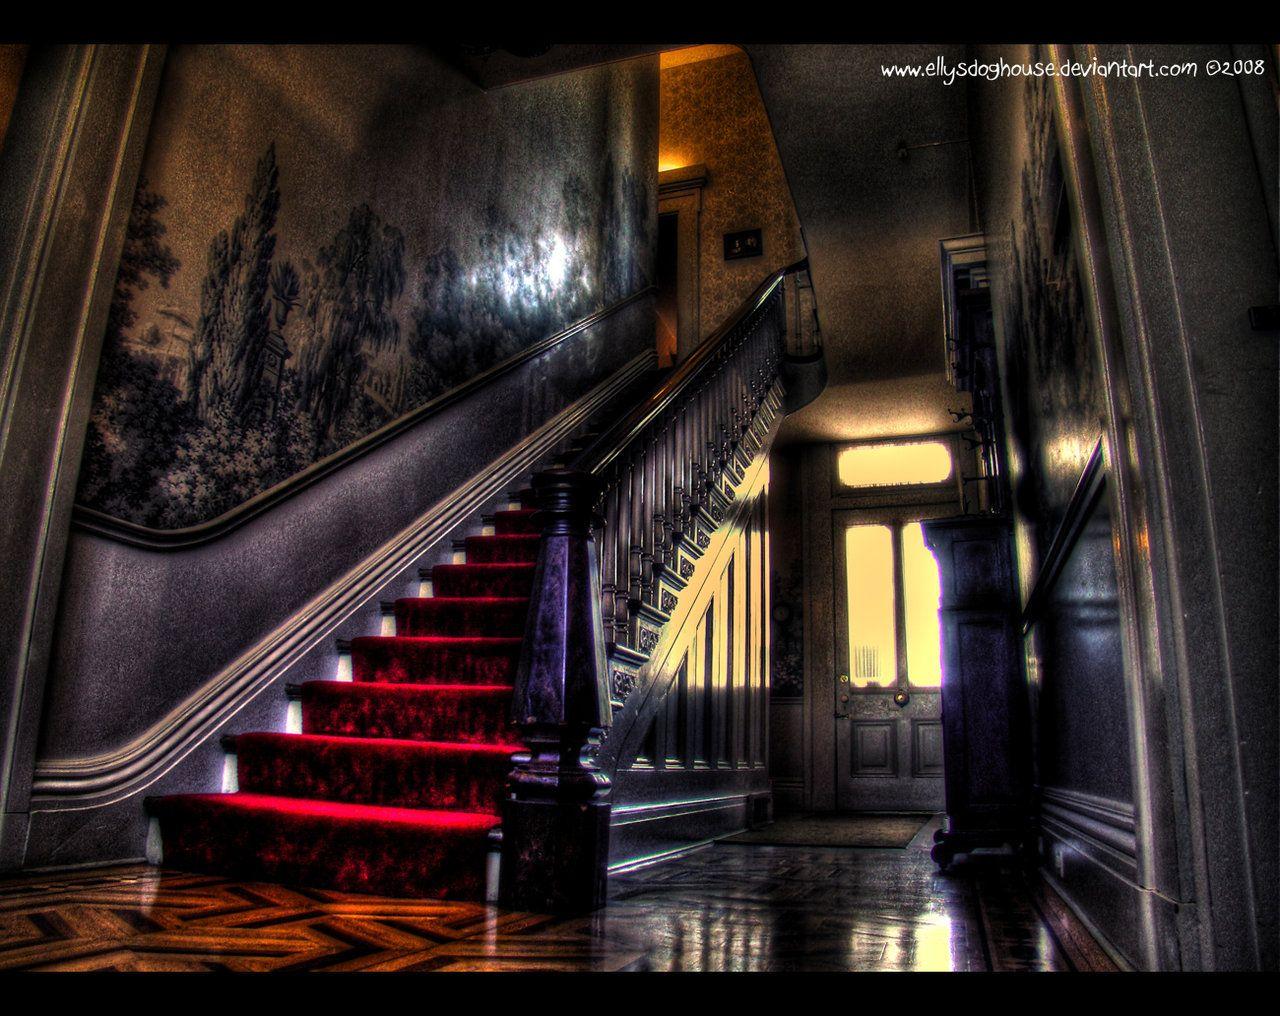 Victorian Mansion Foyer : Demenil mansion entry foyer by ellysdoghouse viantart